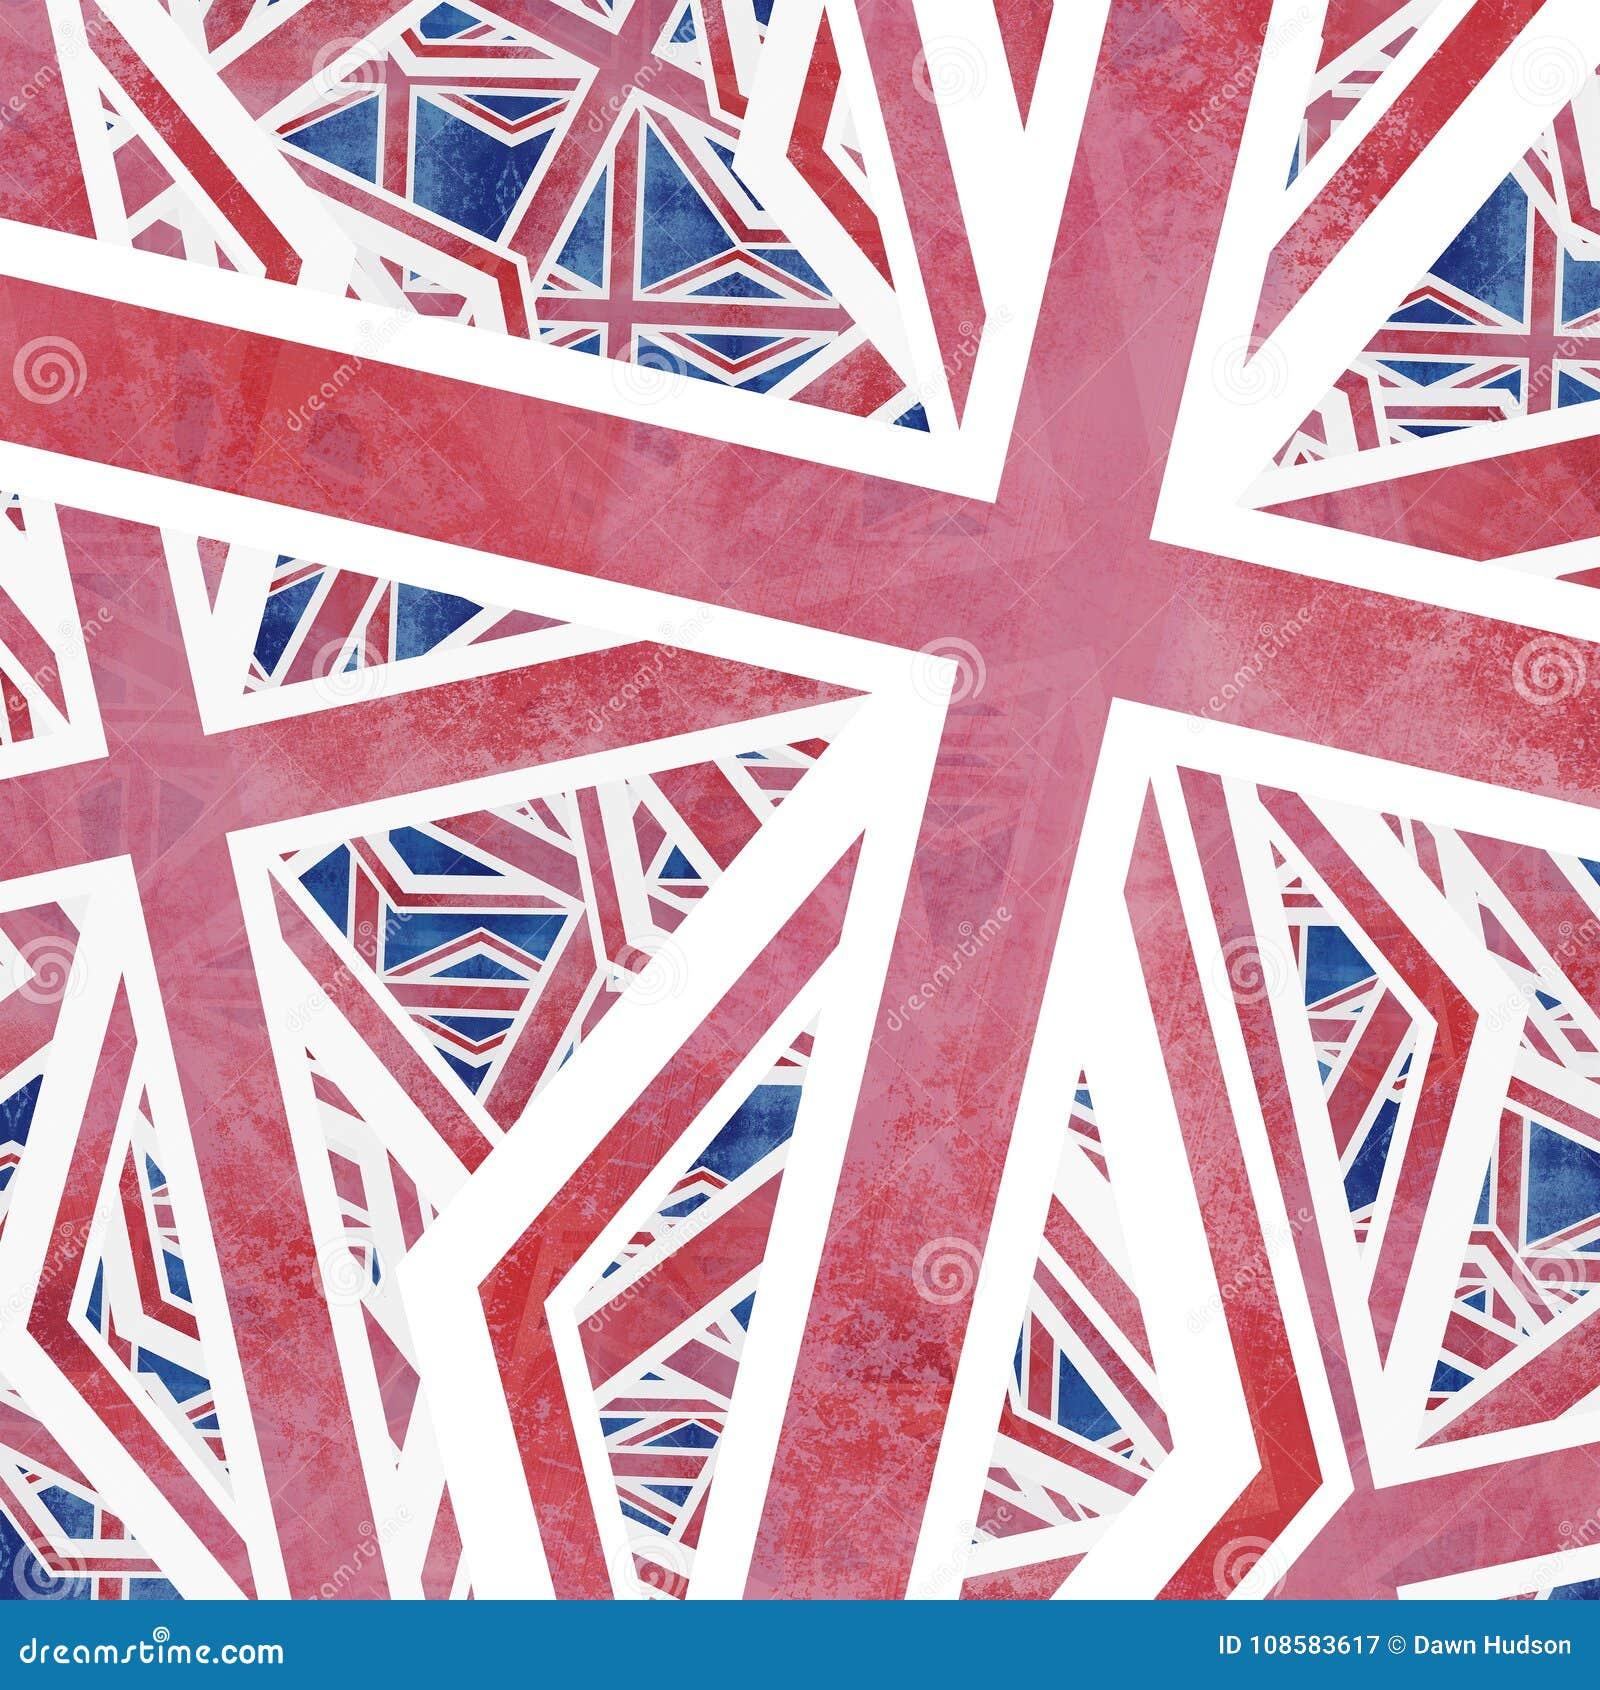 Unión Jack Flag Collage Abstract